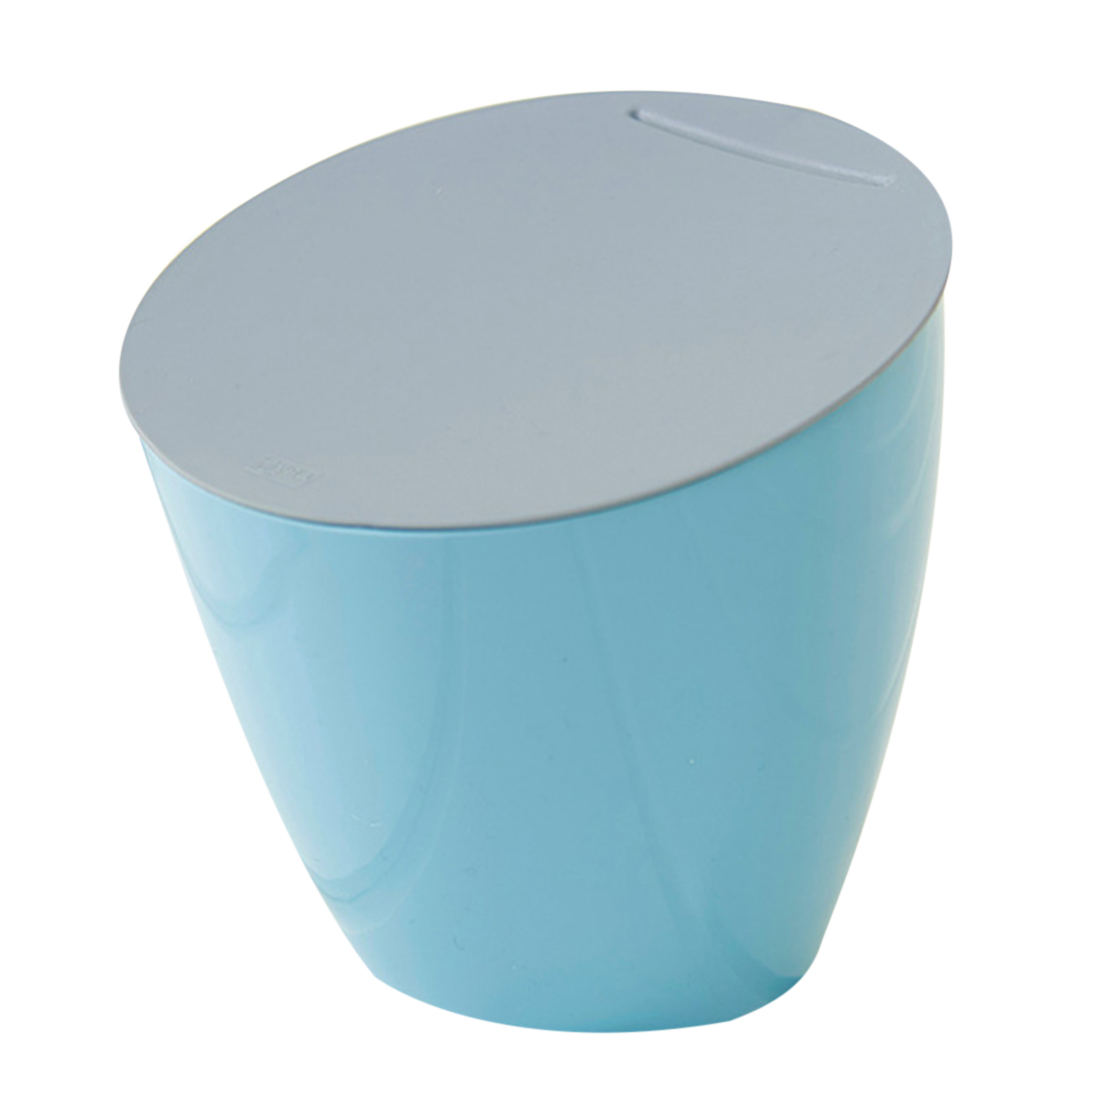 Simple MIni Trash Can Plastic Desktop Wastebasket Storage Bin ...